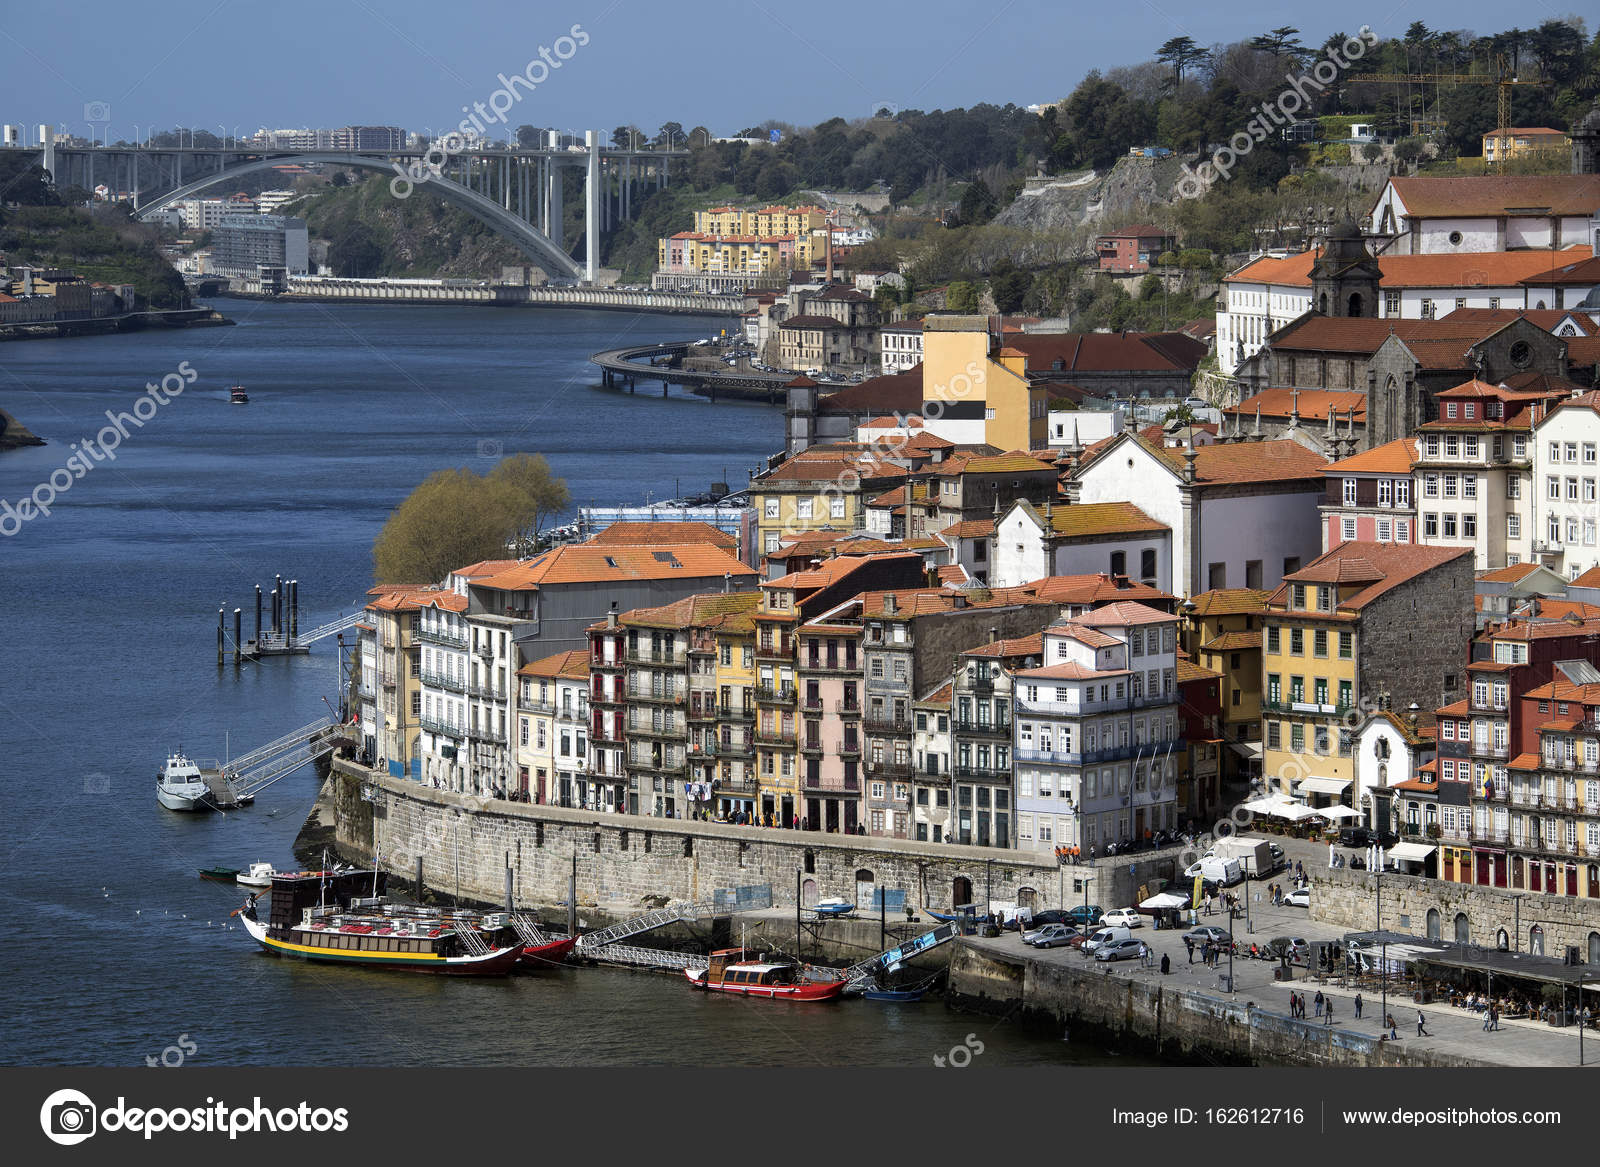 cidade do porto portugal stock photo steve allen 162612716. Black Bedroom Furniture Sets. Home Design Ideas